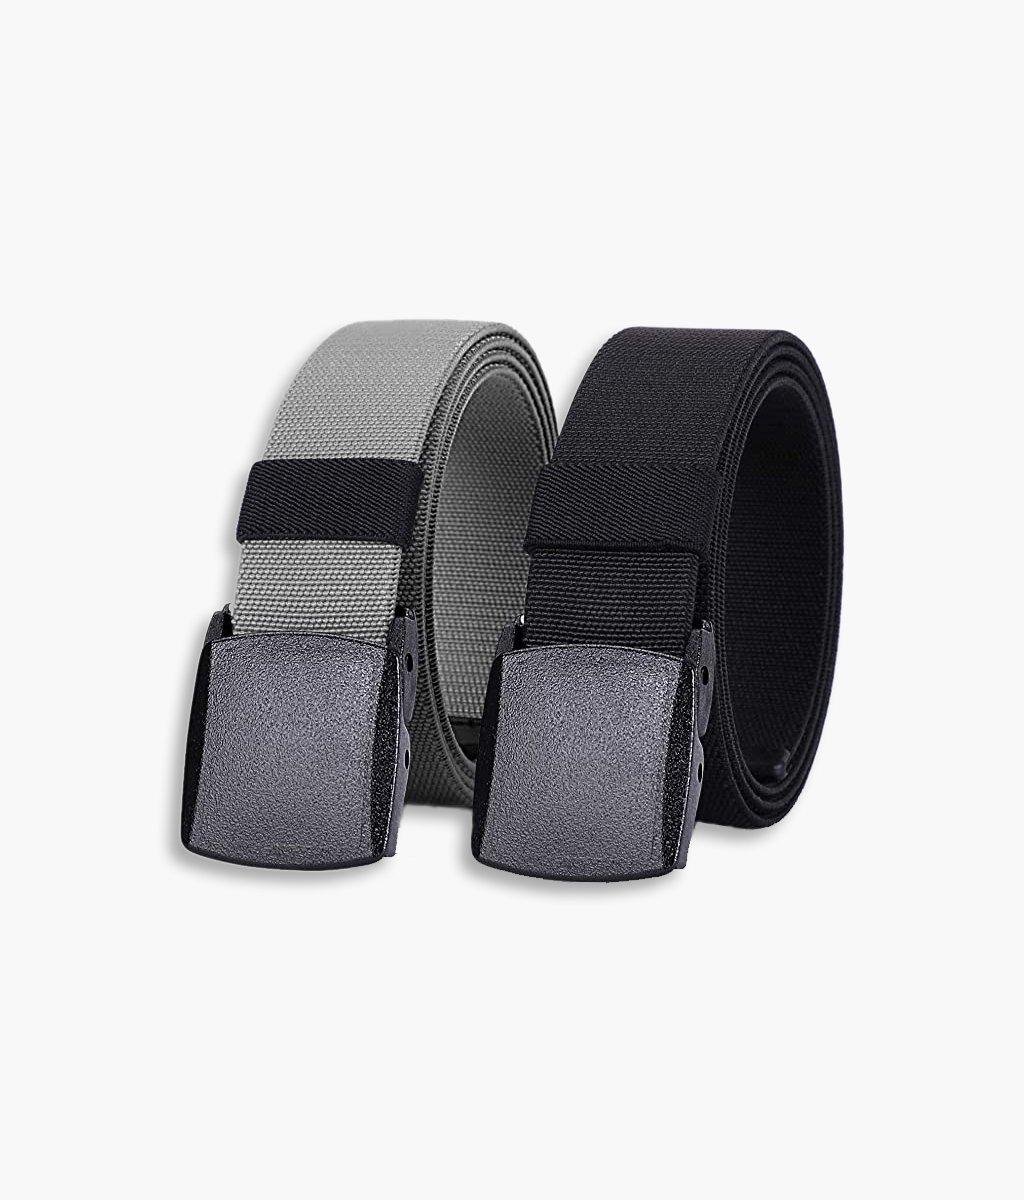 Mens Nylon Belt 51 inch Elastic Stretch